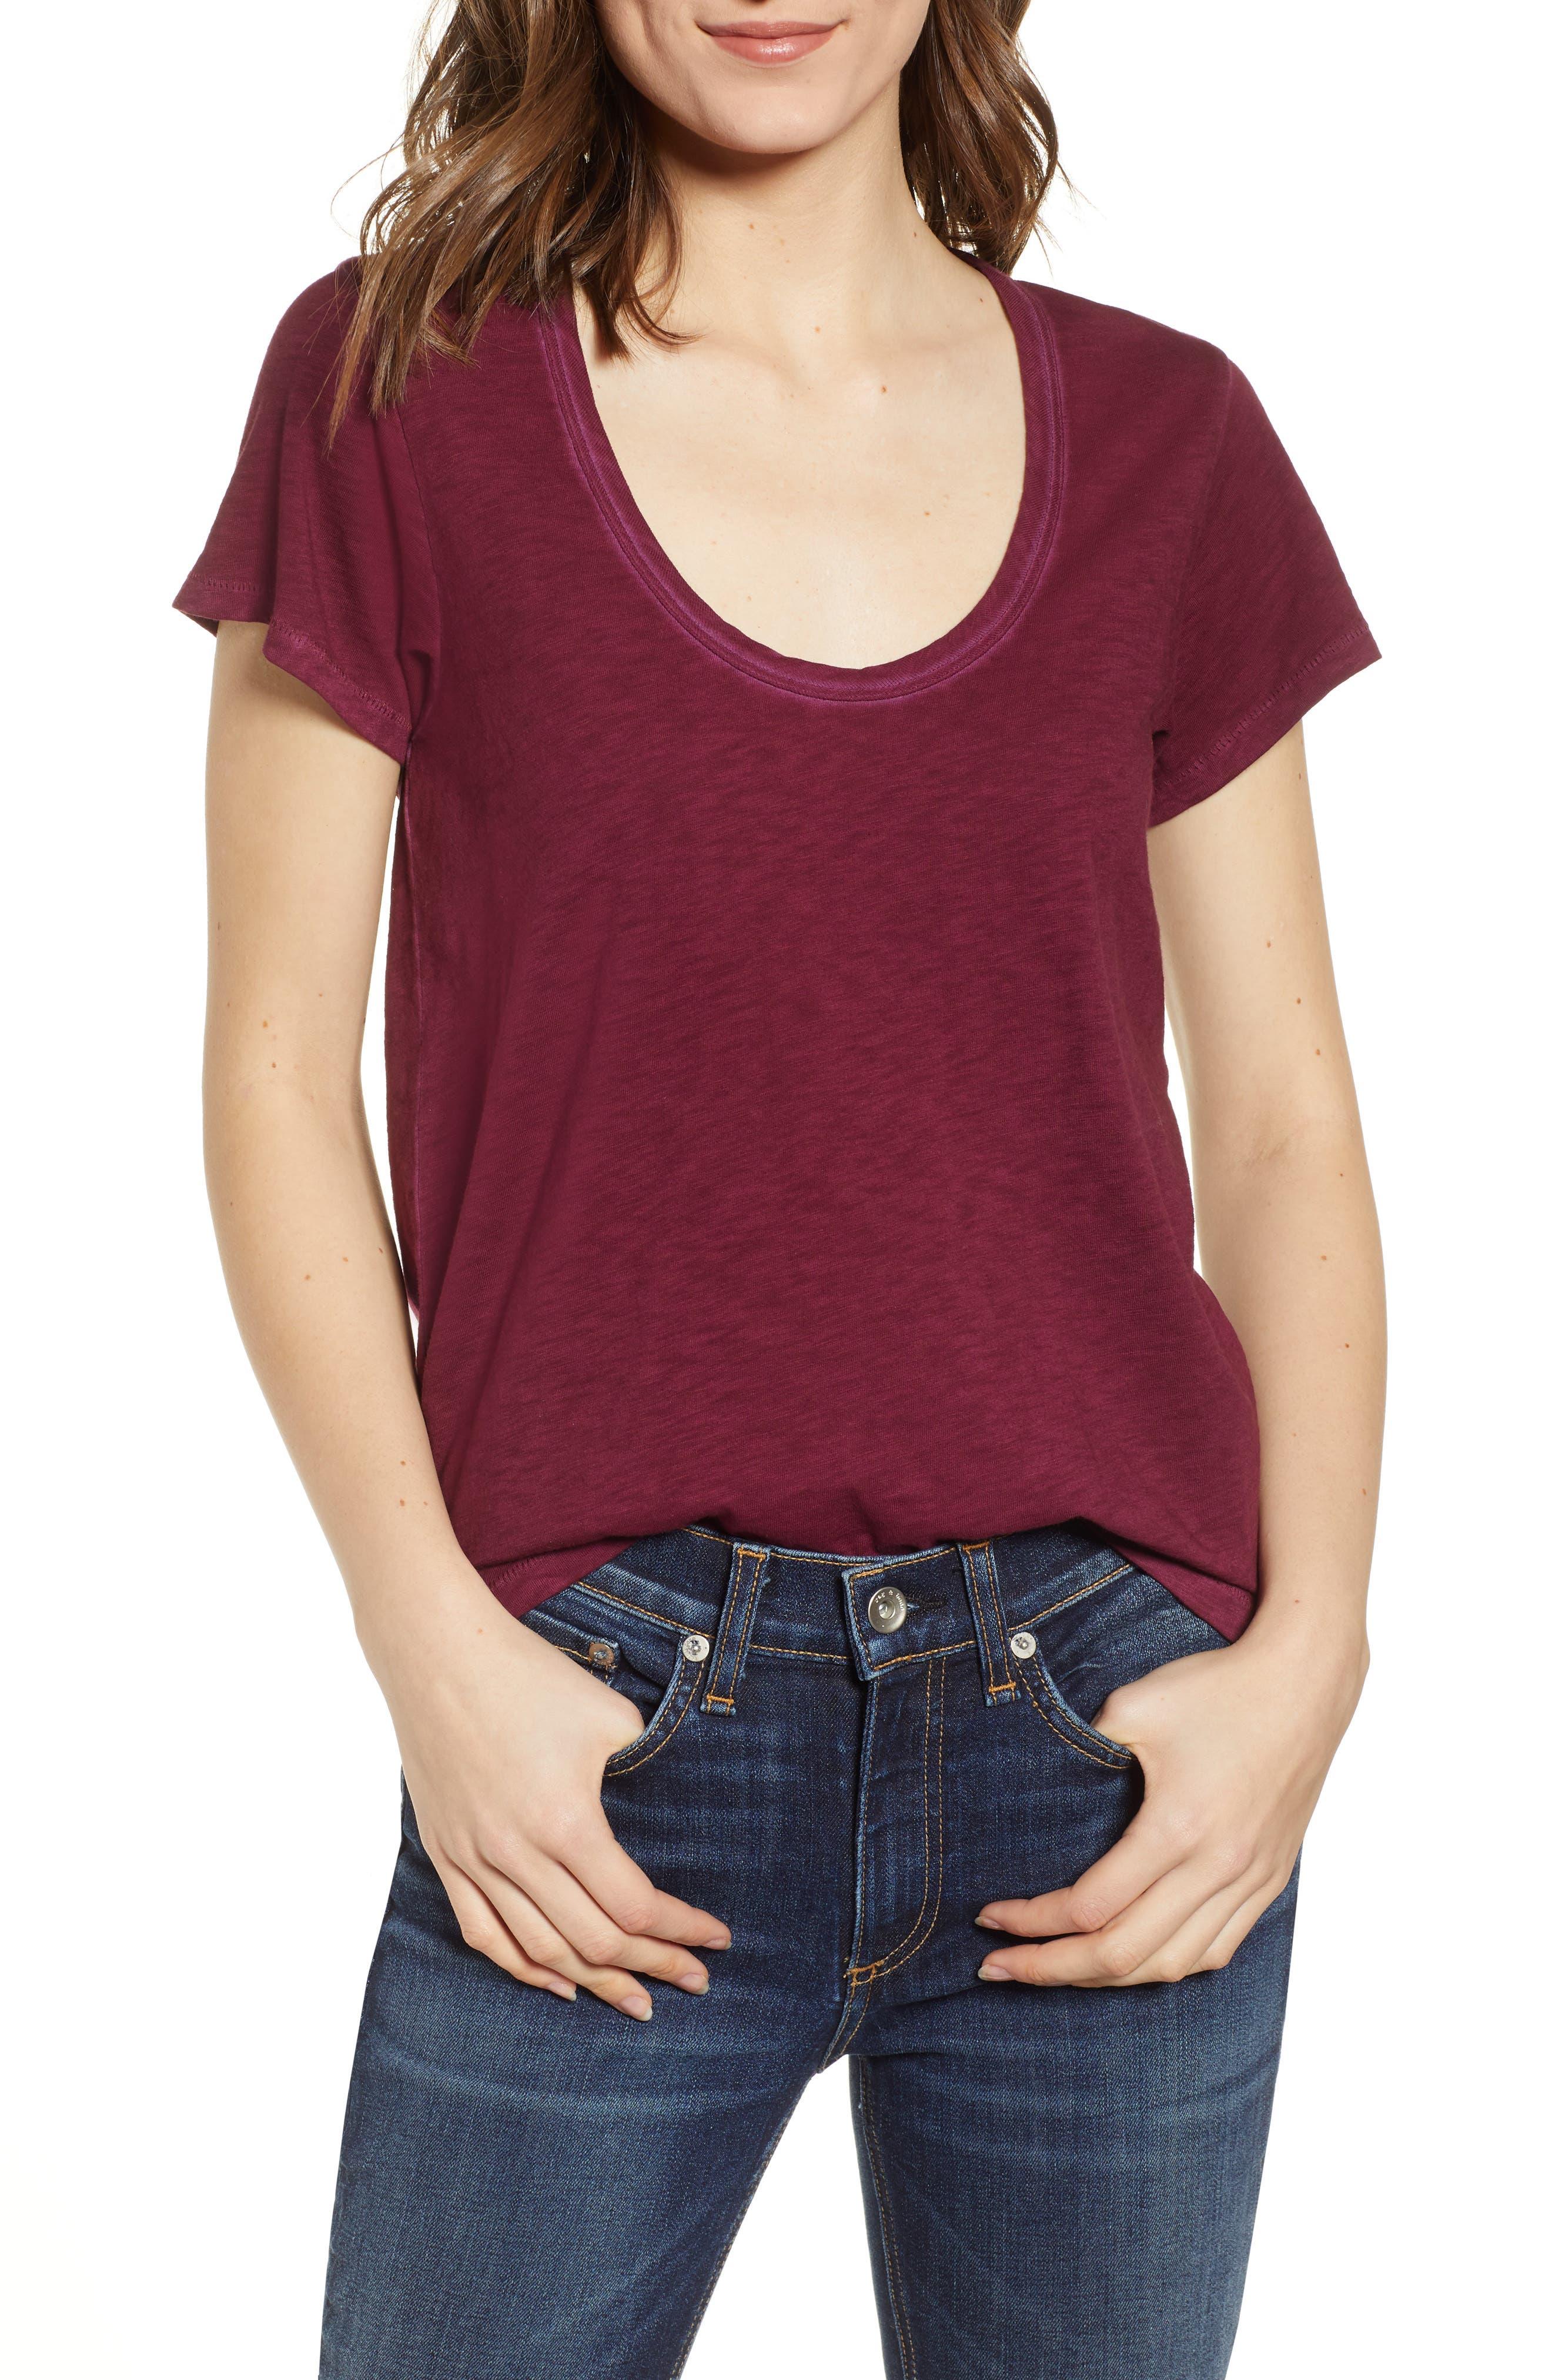 The Tee Short-Sleeve Crewneck T-Shirt in Dusty